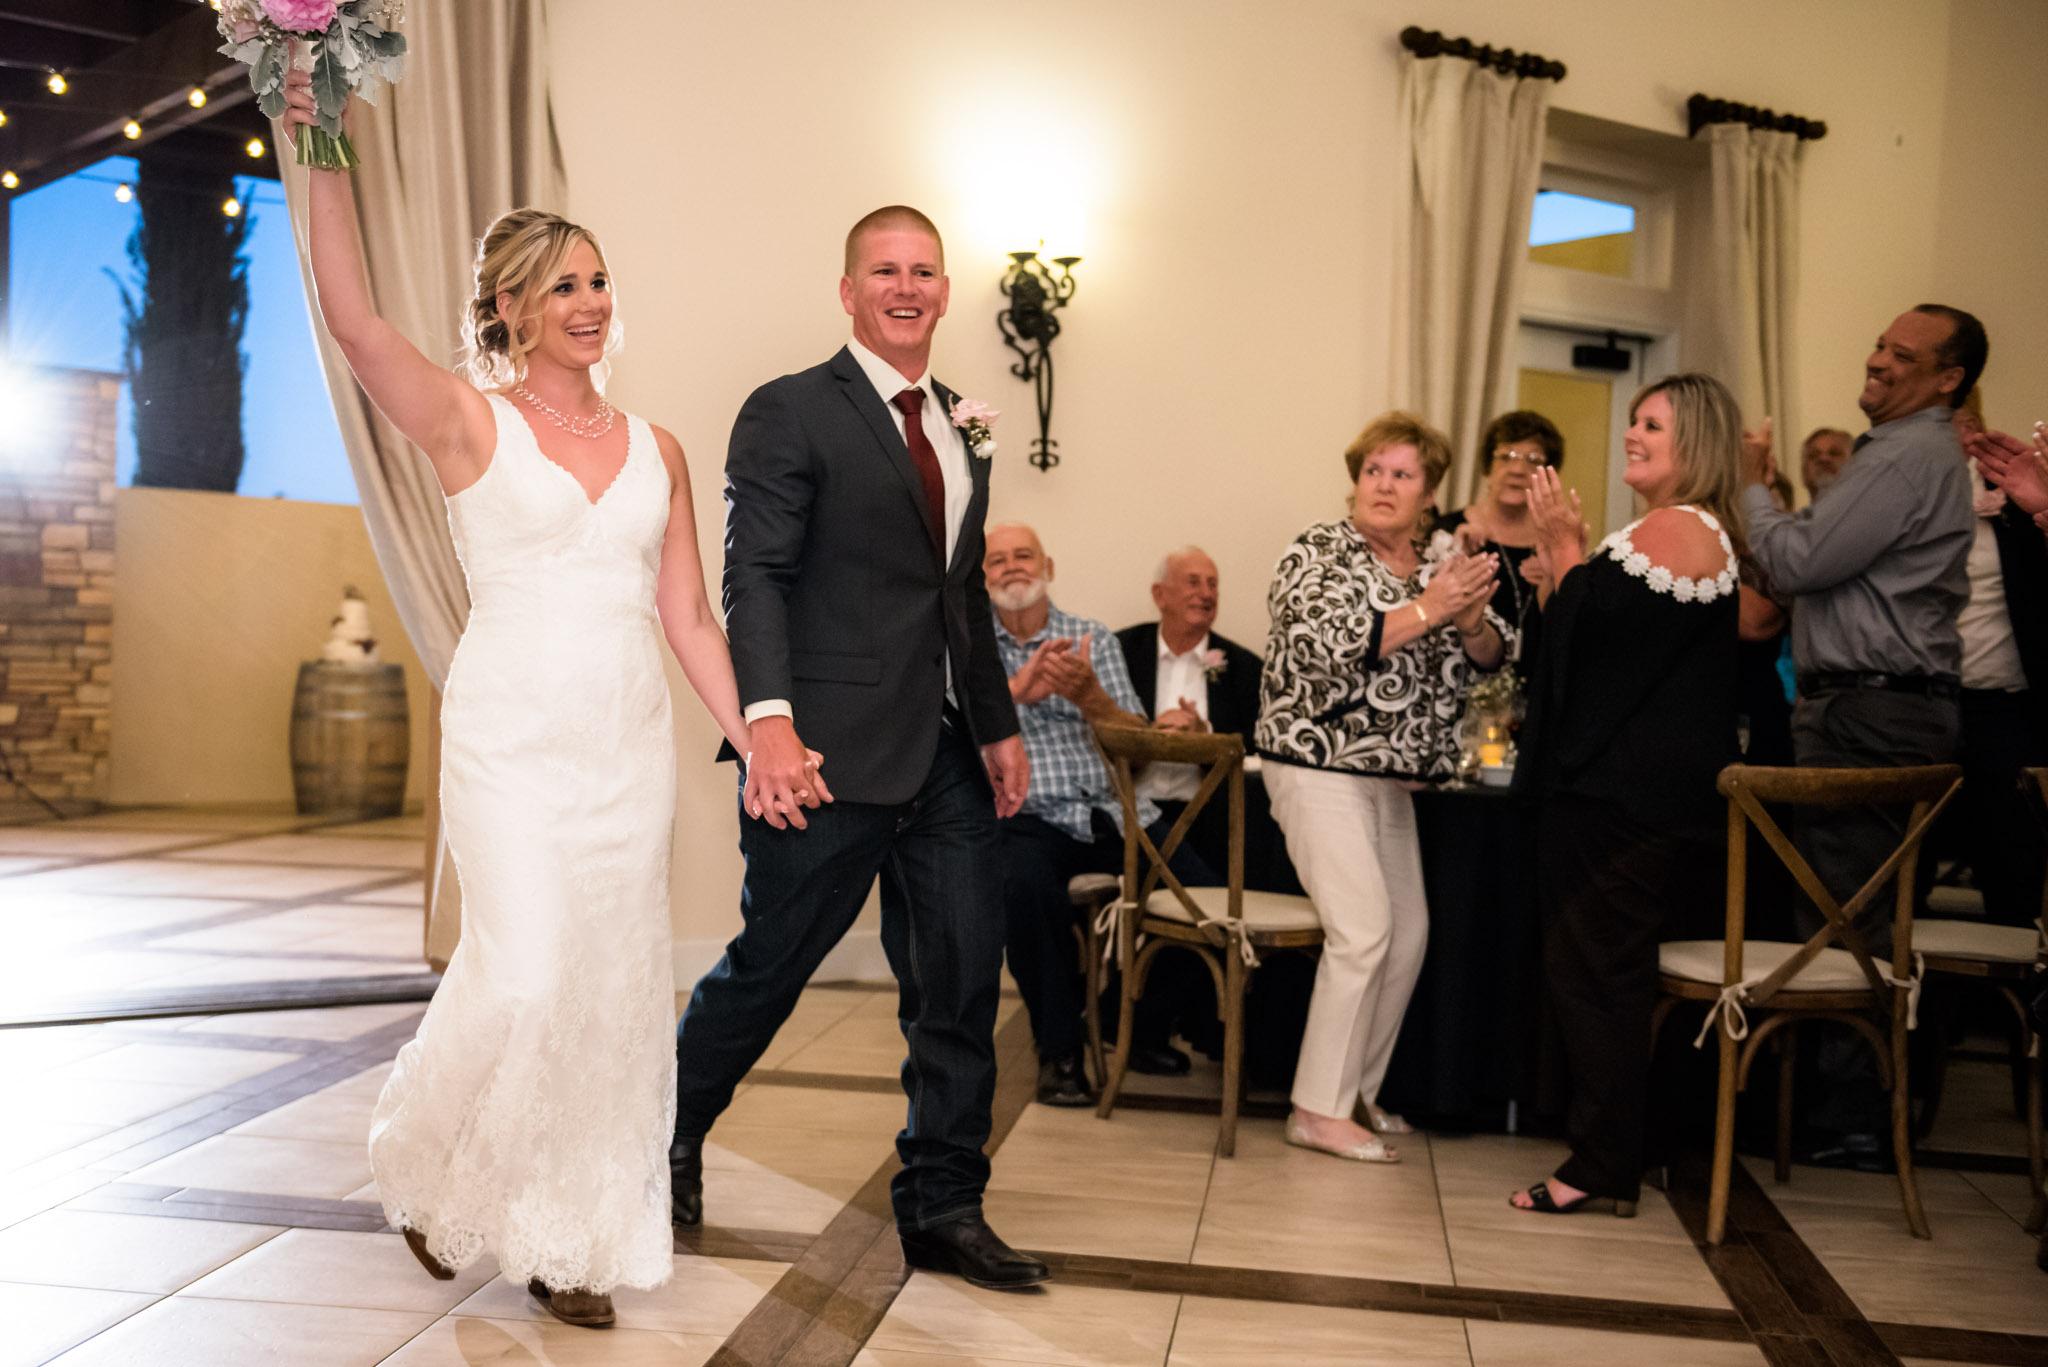 Avensole-Winery-Temecula-Wedding-Josh-and-Olivia-3893.JPG